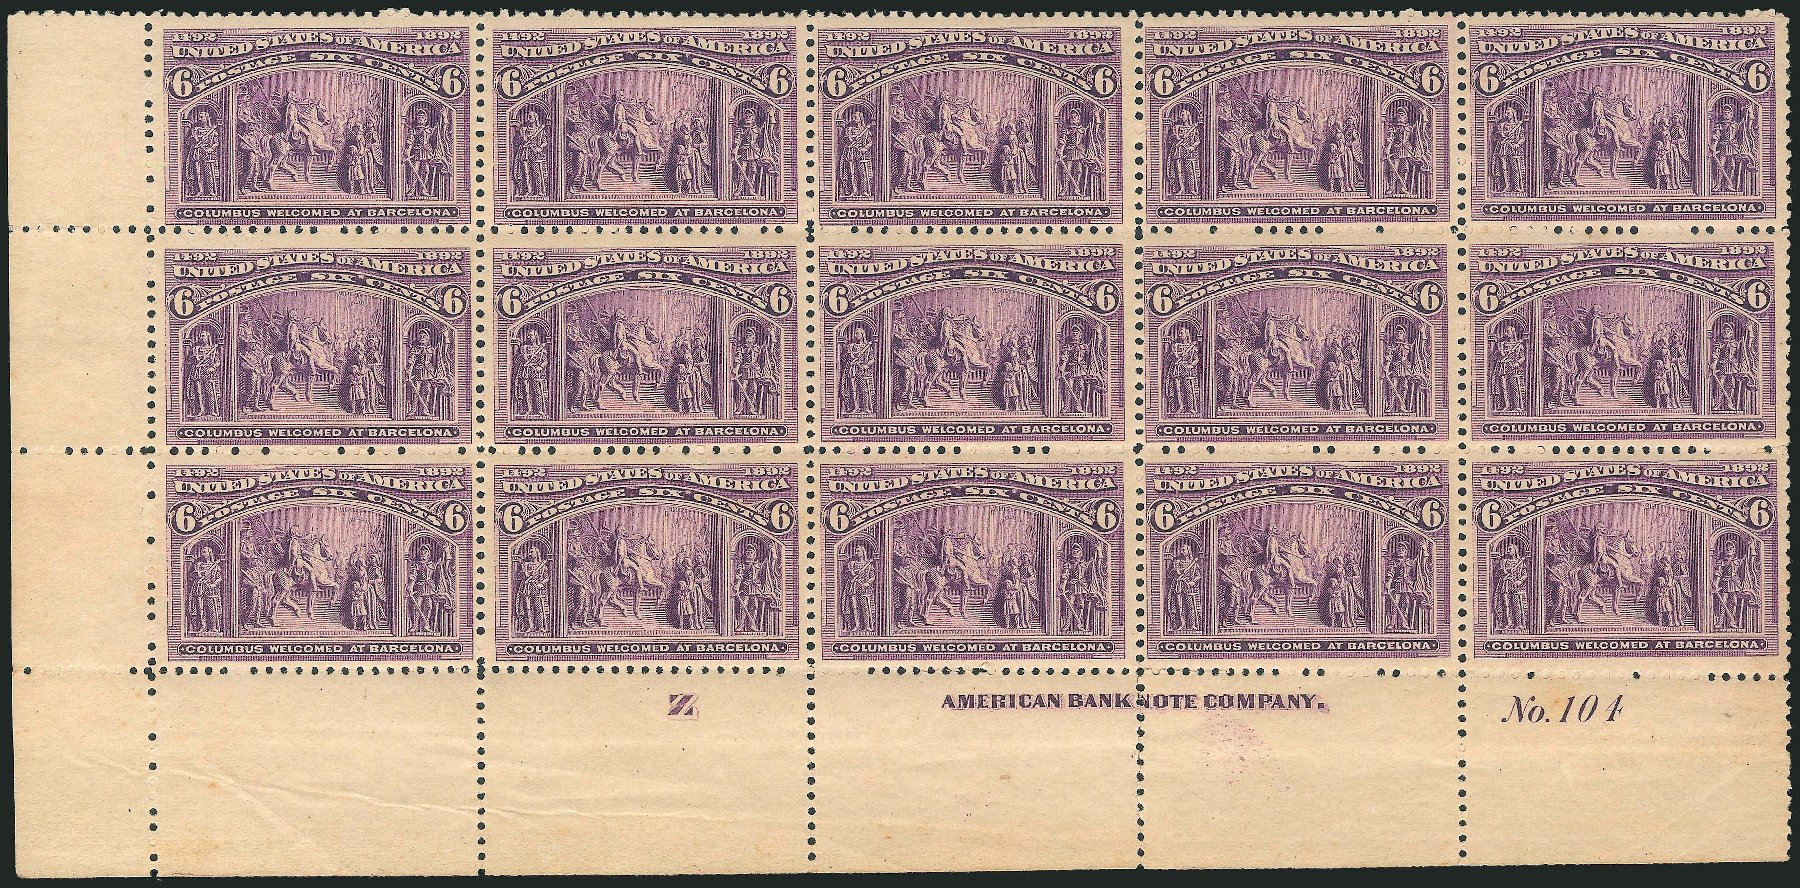 US Stamp Price Scott #235 - 1893 6c Columbian Exposition. Robert Siegel Auction Galleries, Jun 2015, Sale 1100, Lot 46